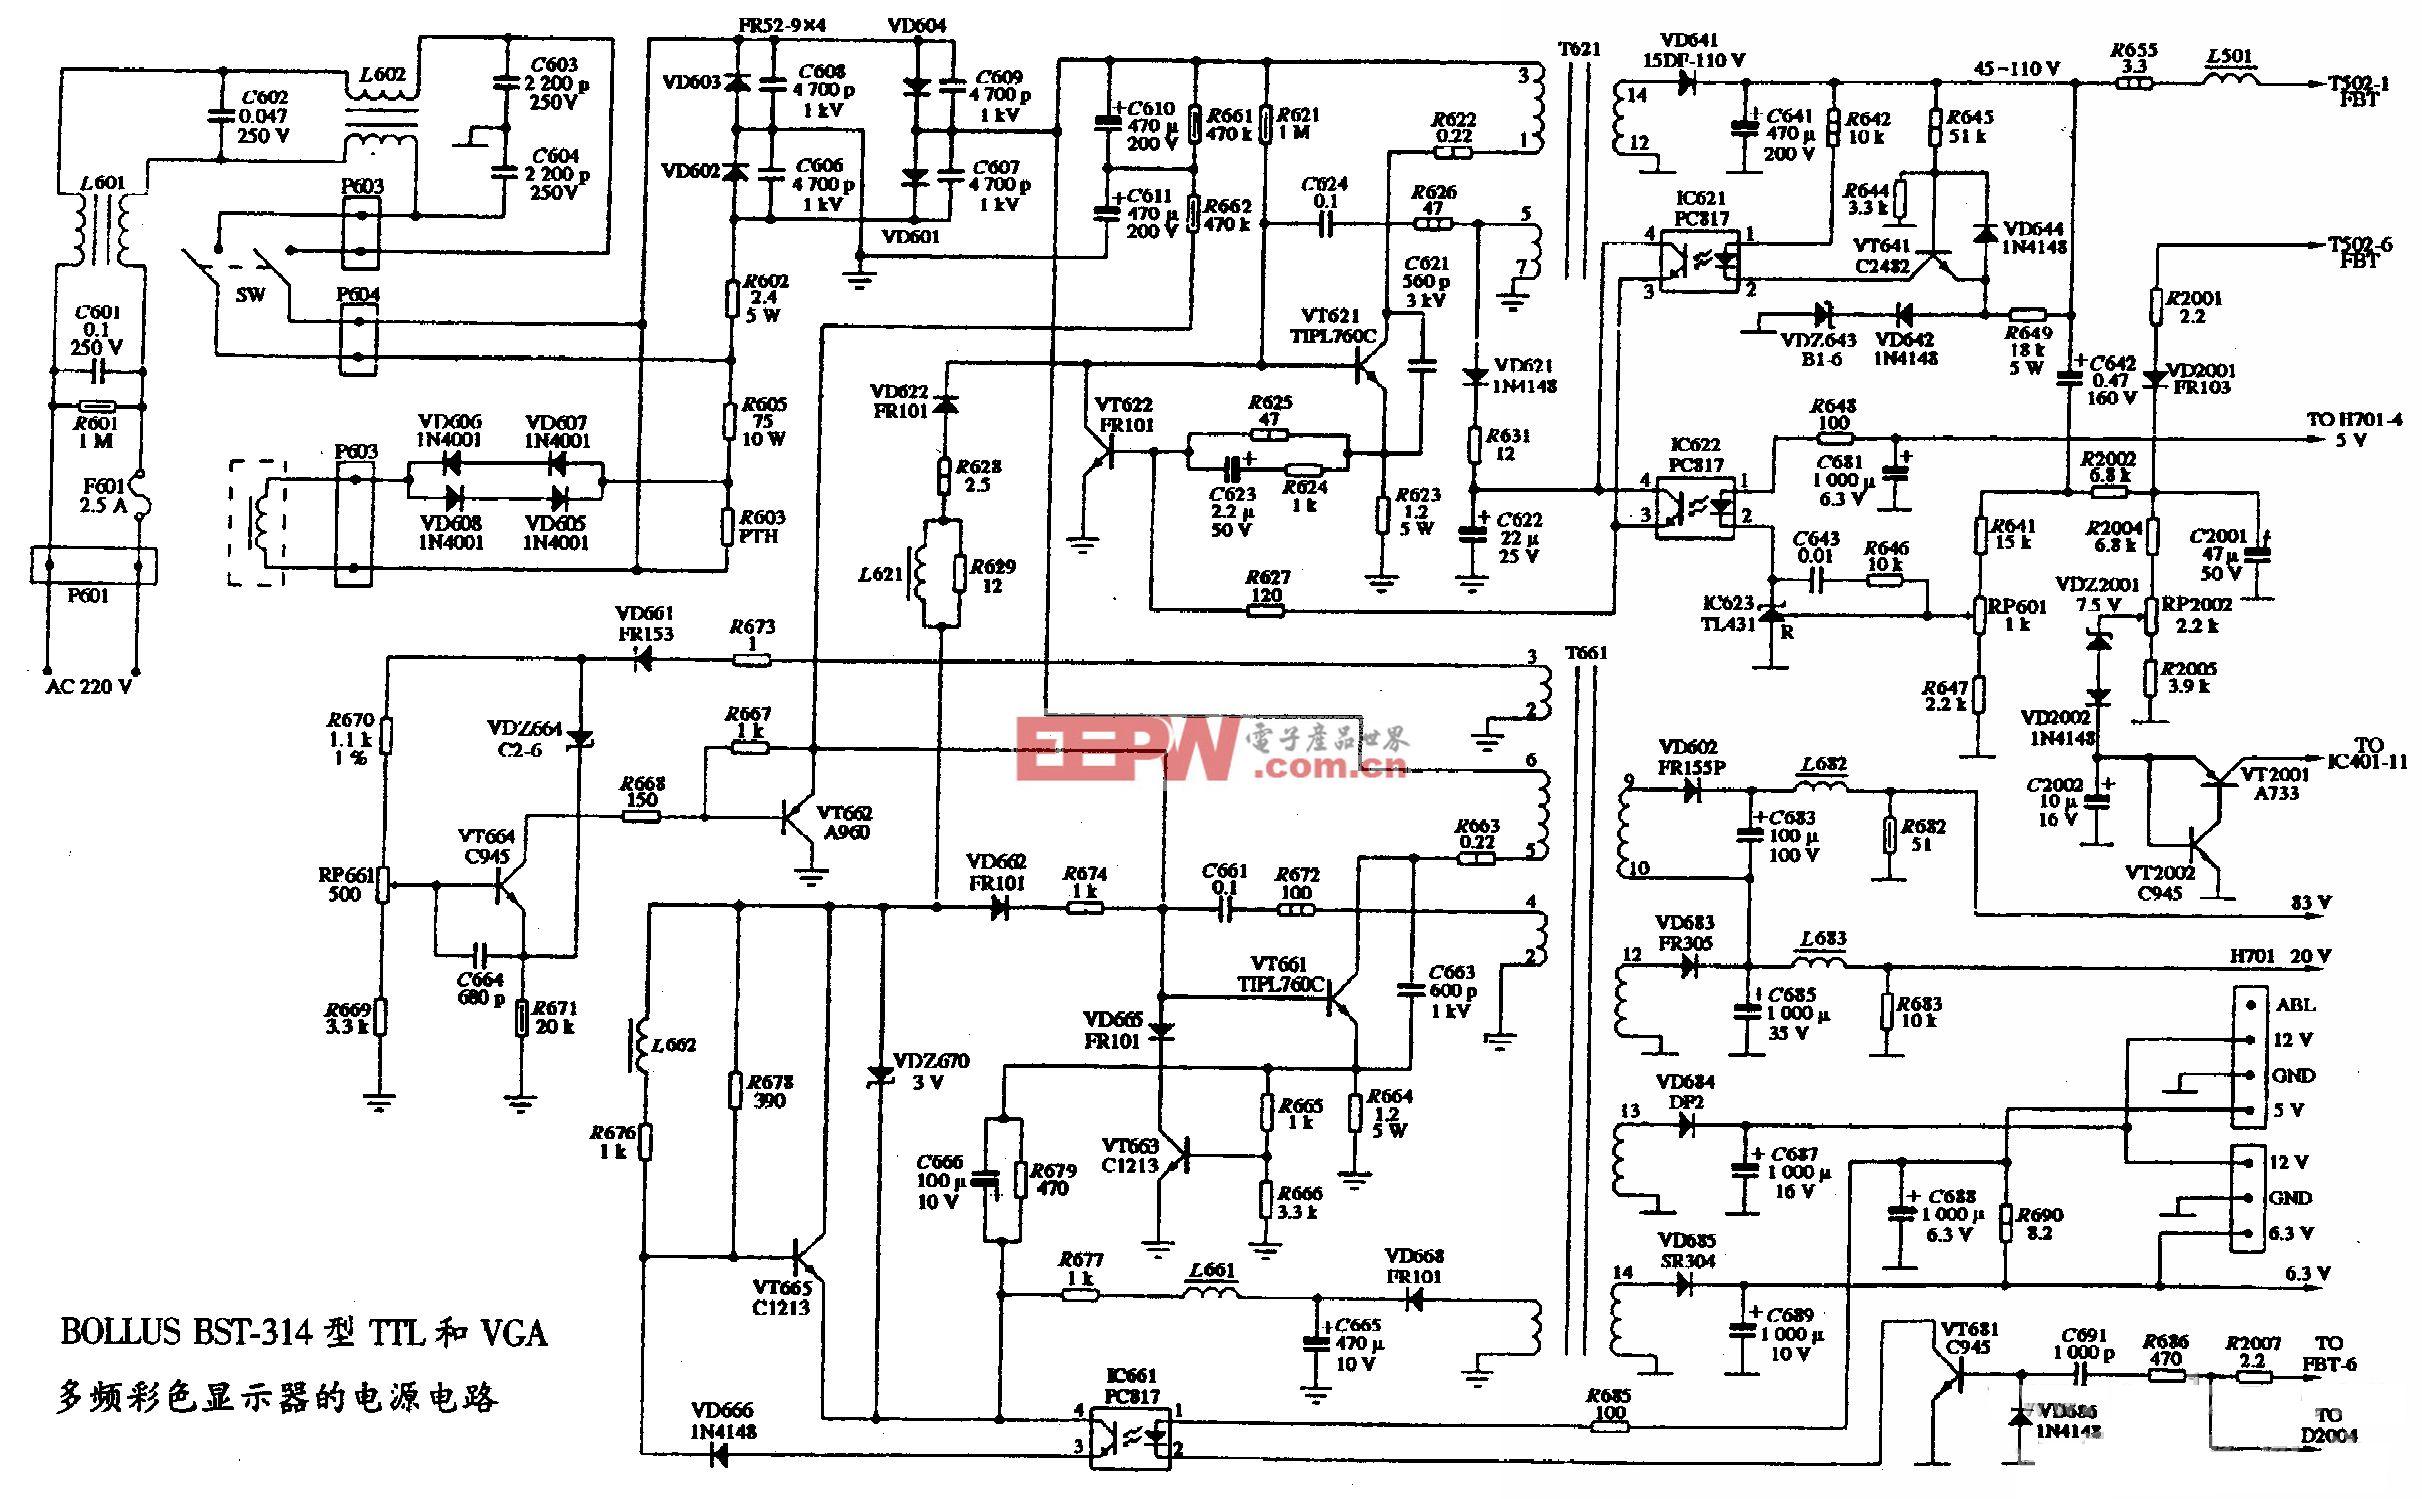 BOLLUS BST-314型TTL和VGA多频彩色显示器的电源电路图